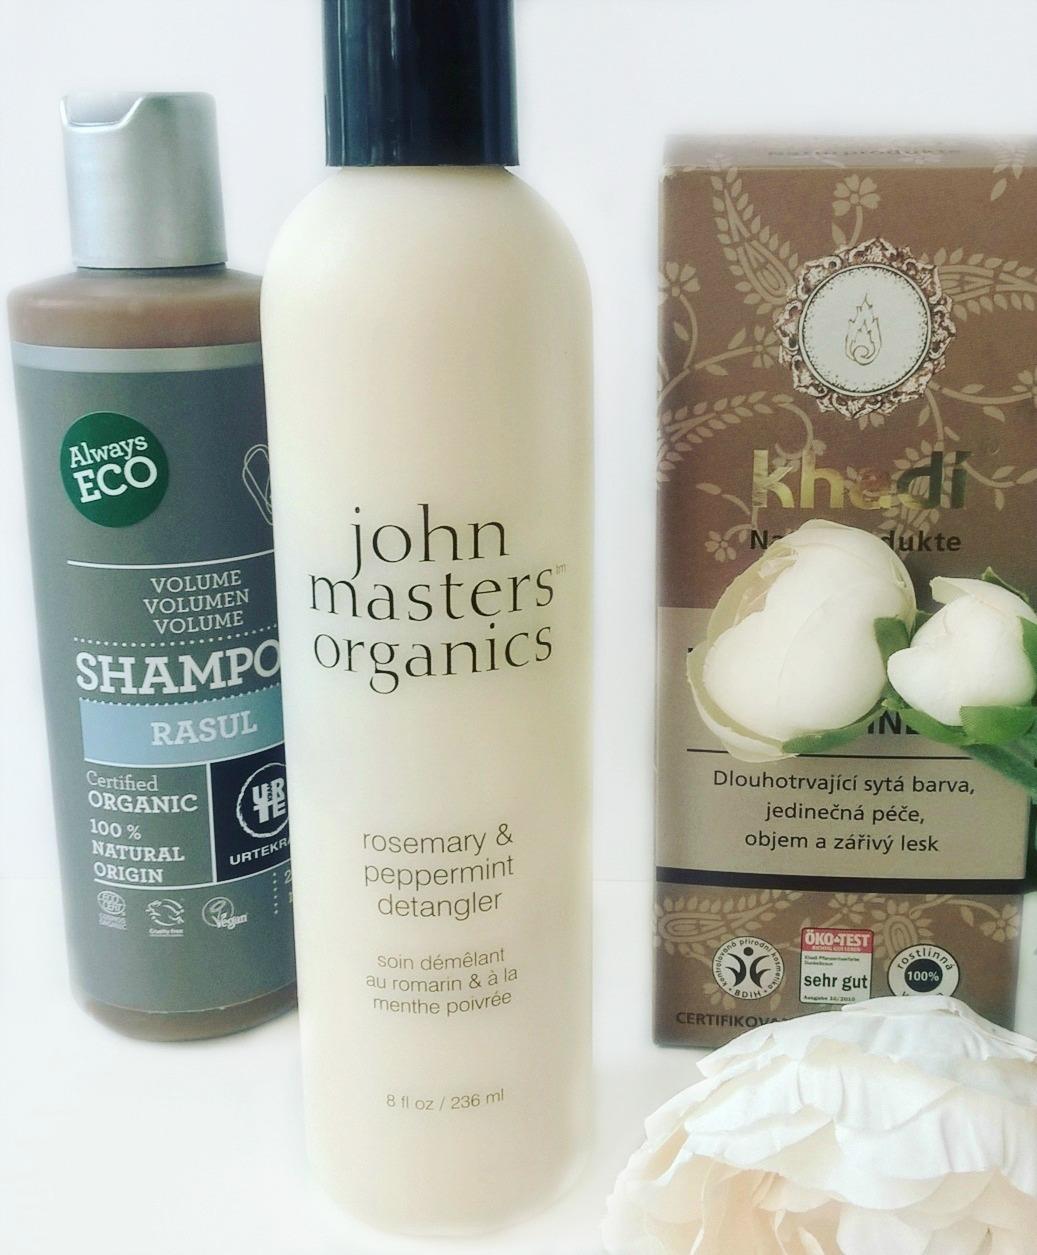 Iwos, Ecco Verde, Organicall, Plants for Beauty - kosmetyki John Masters, Urtekram, Khadi